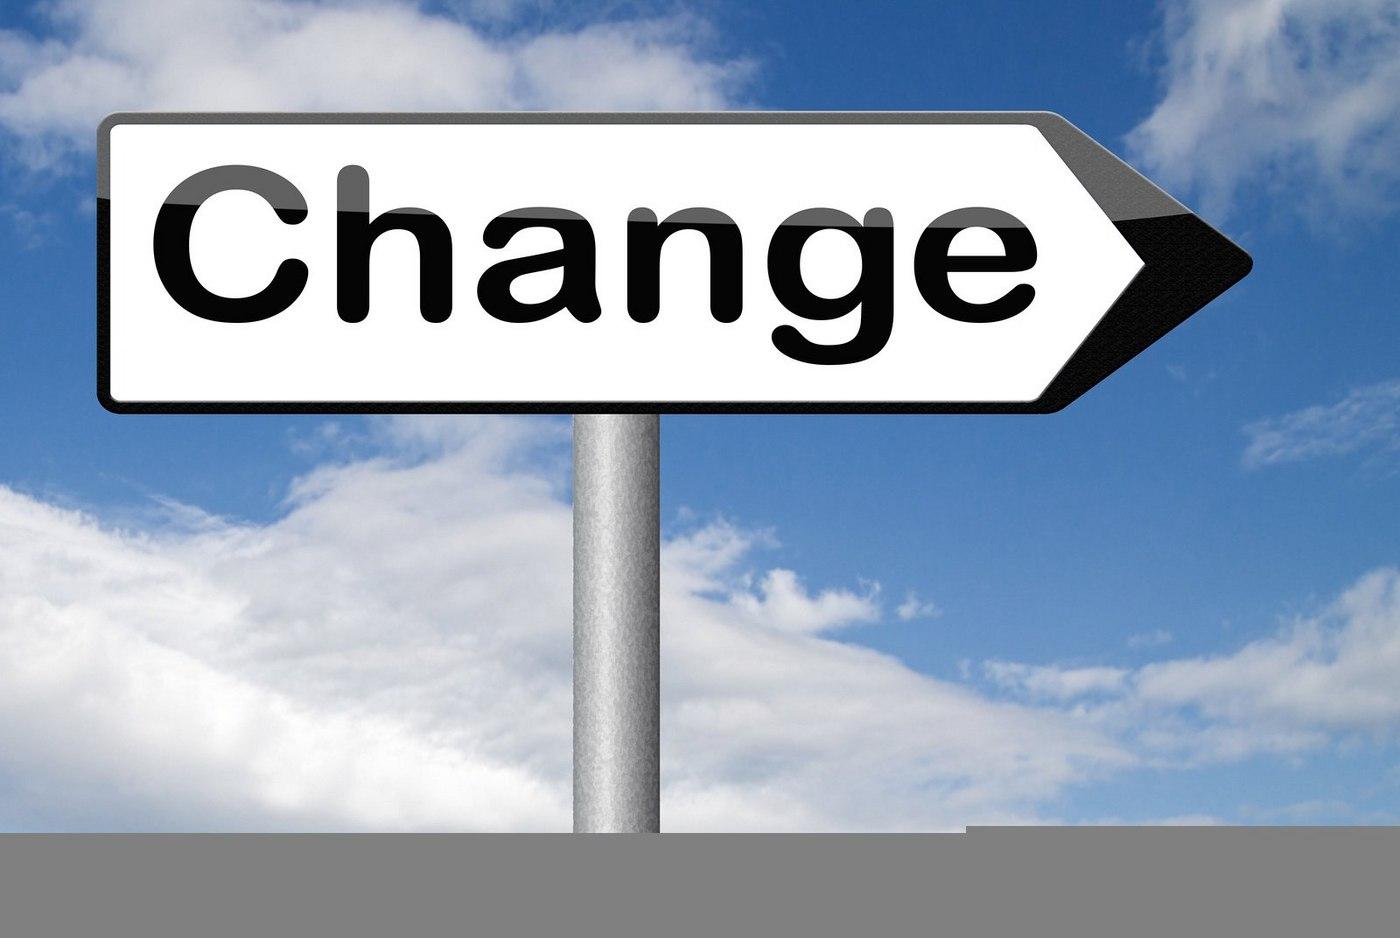 bigstock-change-now-take-another-direct-79587448.jpg.crdownload.jpeg